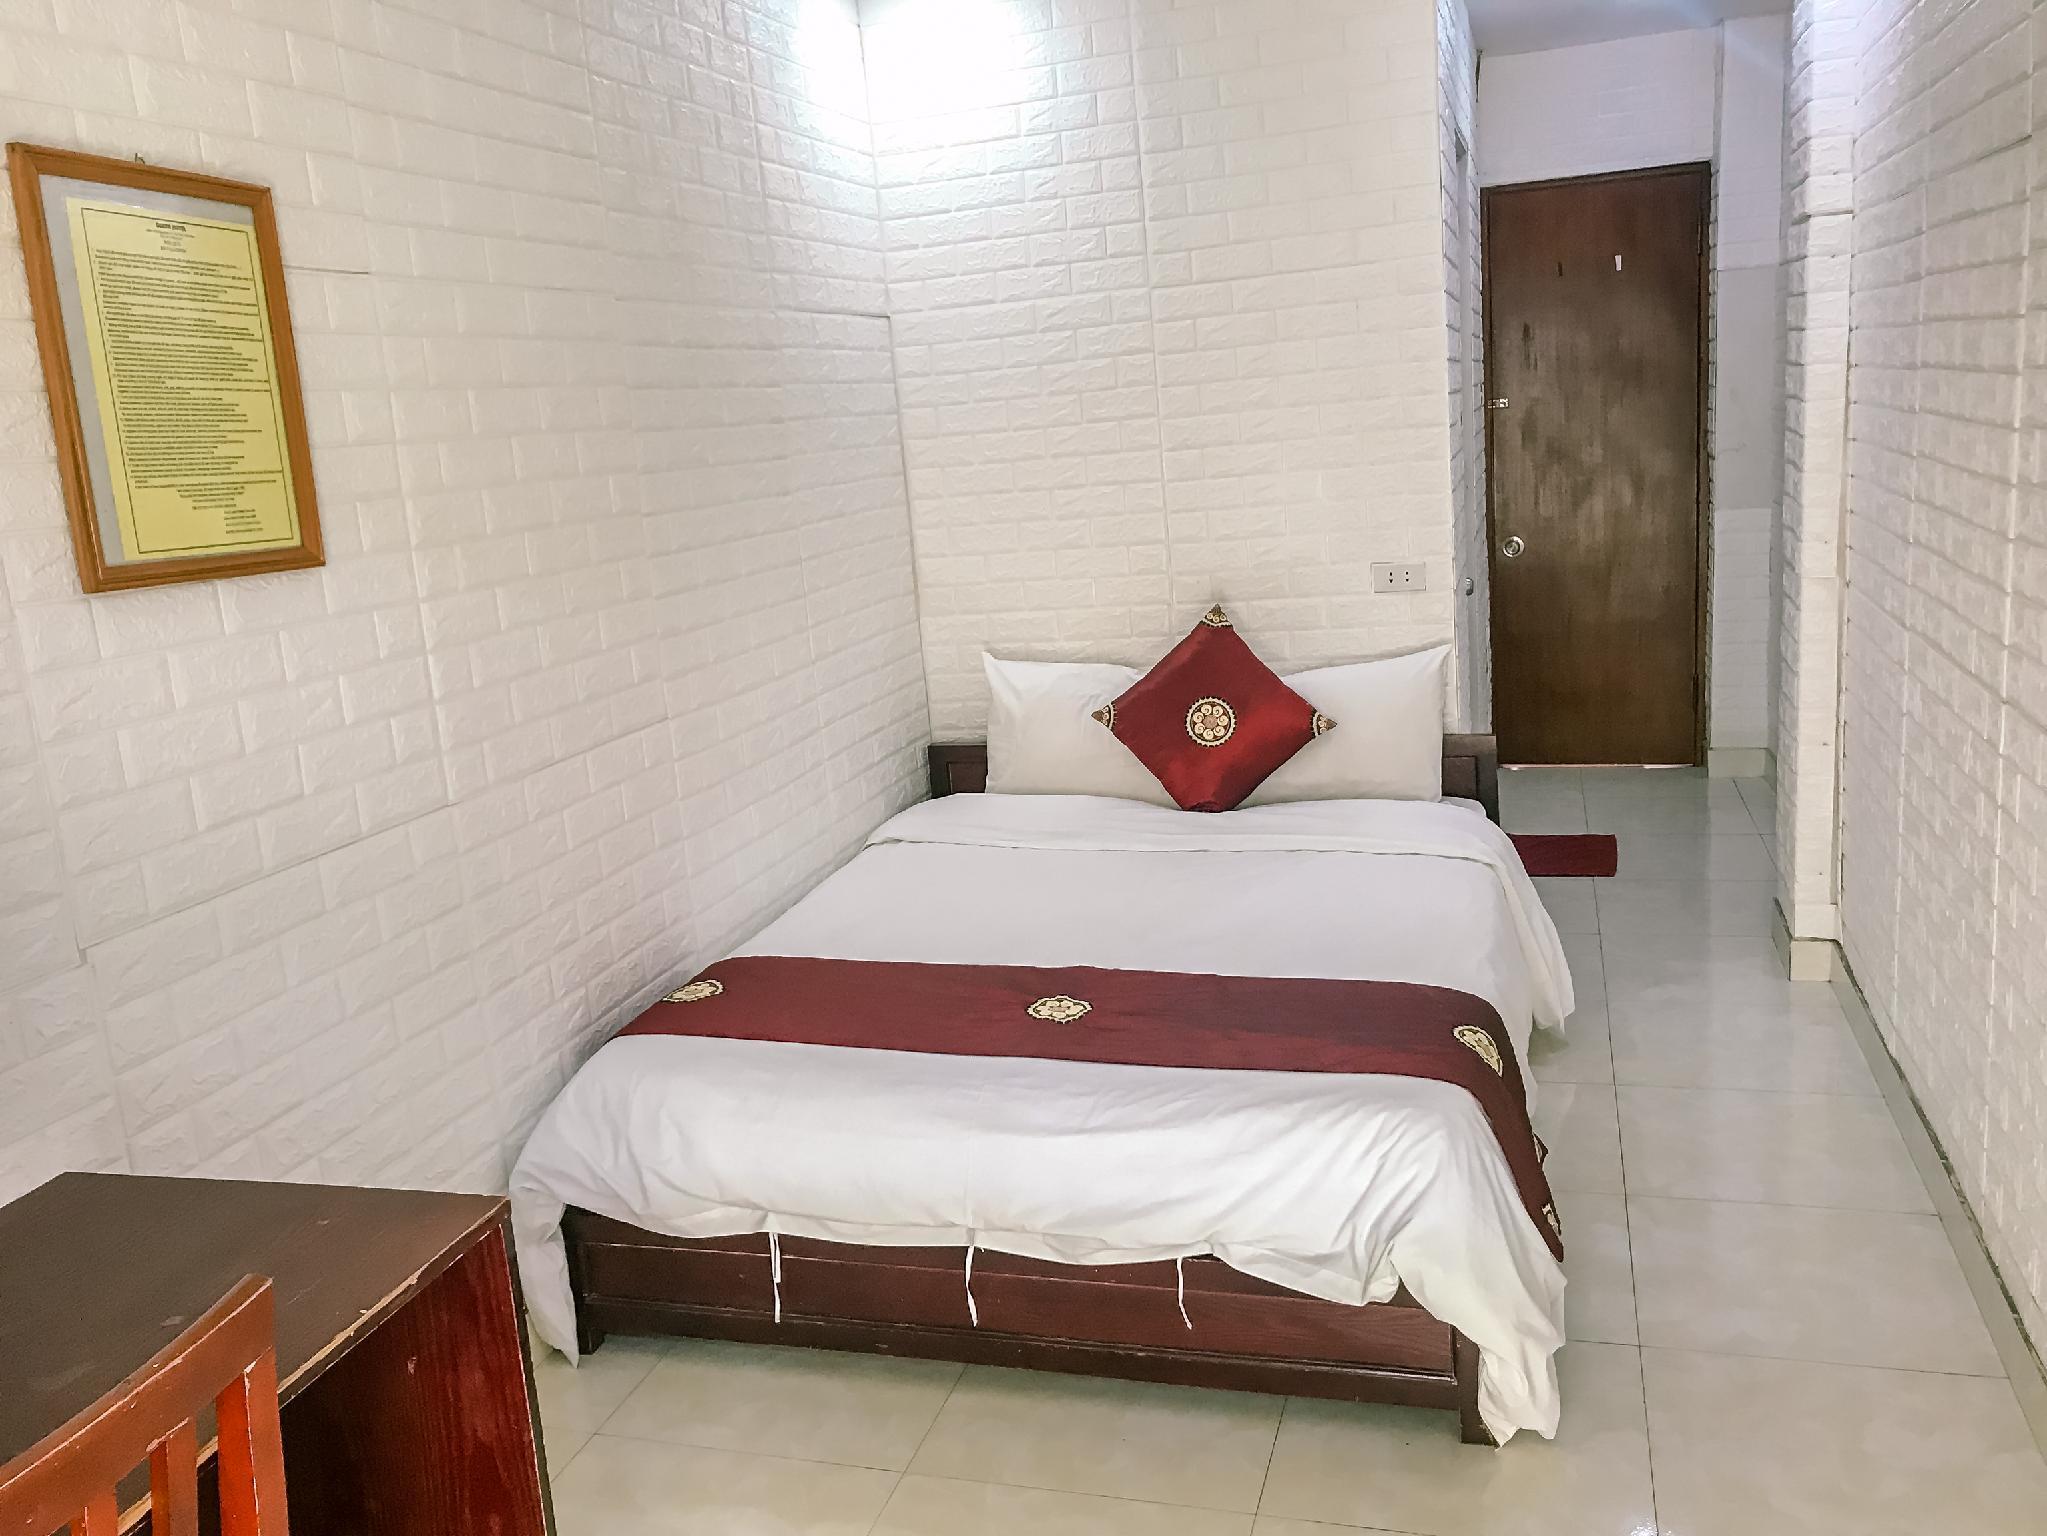 Salle De Bain Borgne spot on 604 queen hotel (spot-on) in hanoi - room deals